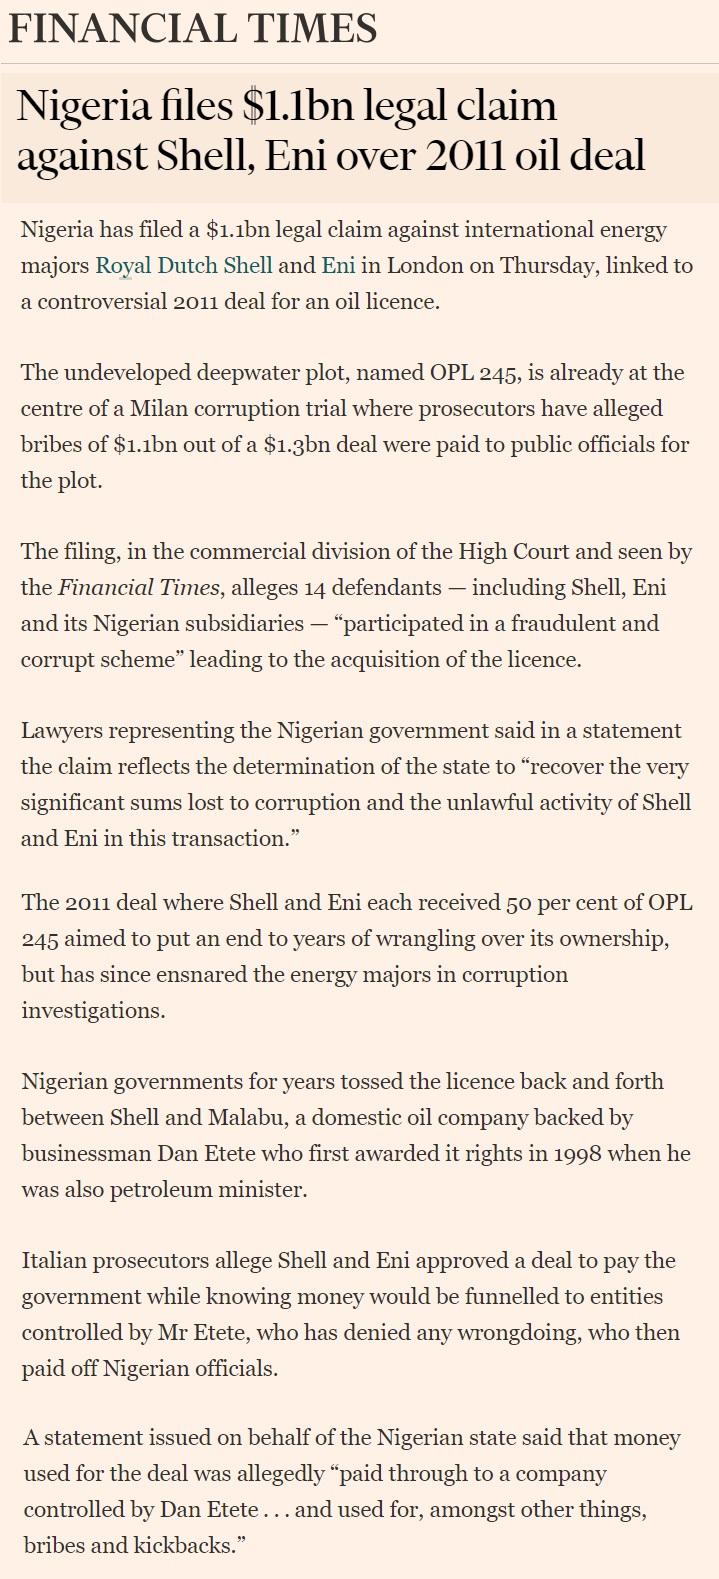 Nigeria file 1 1 billion dollar legal clam against Shell and